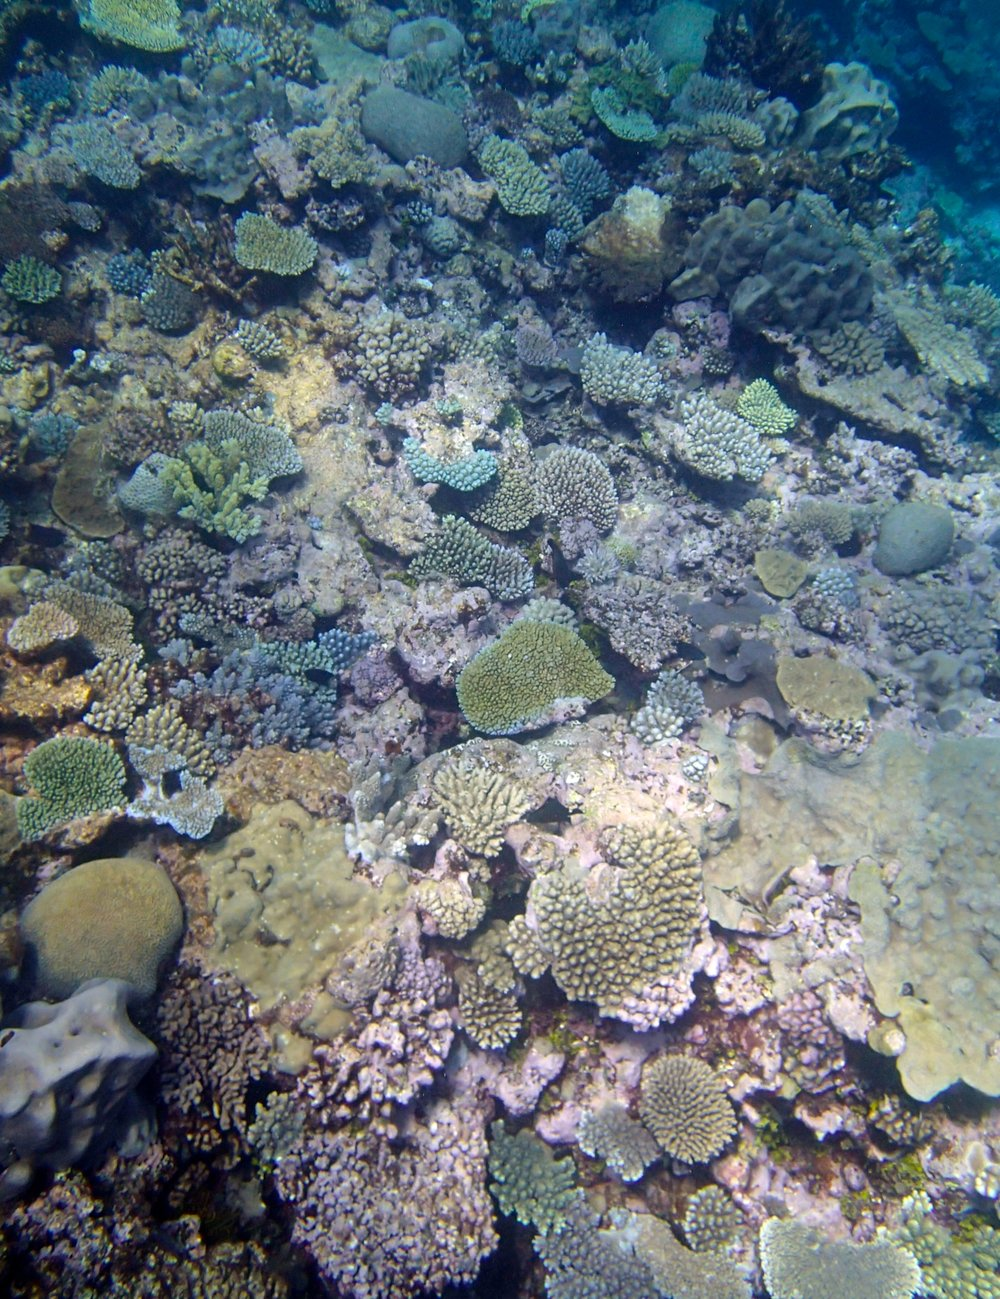 11-19-13 Surprise Atoll.jpg